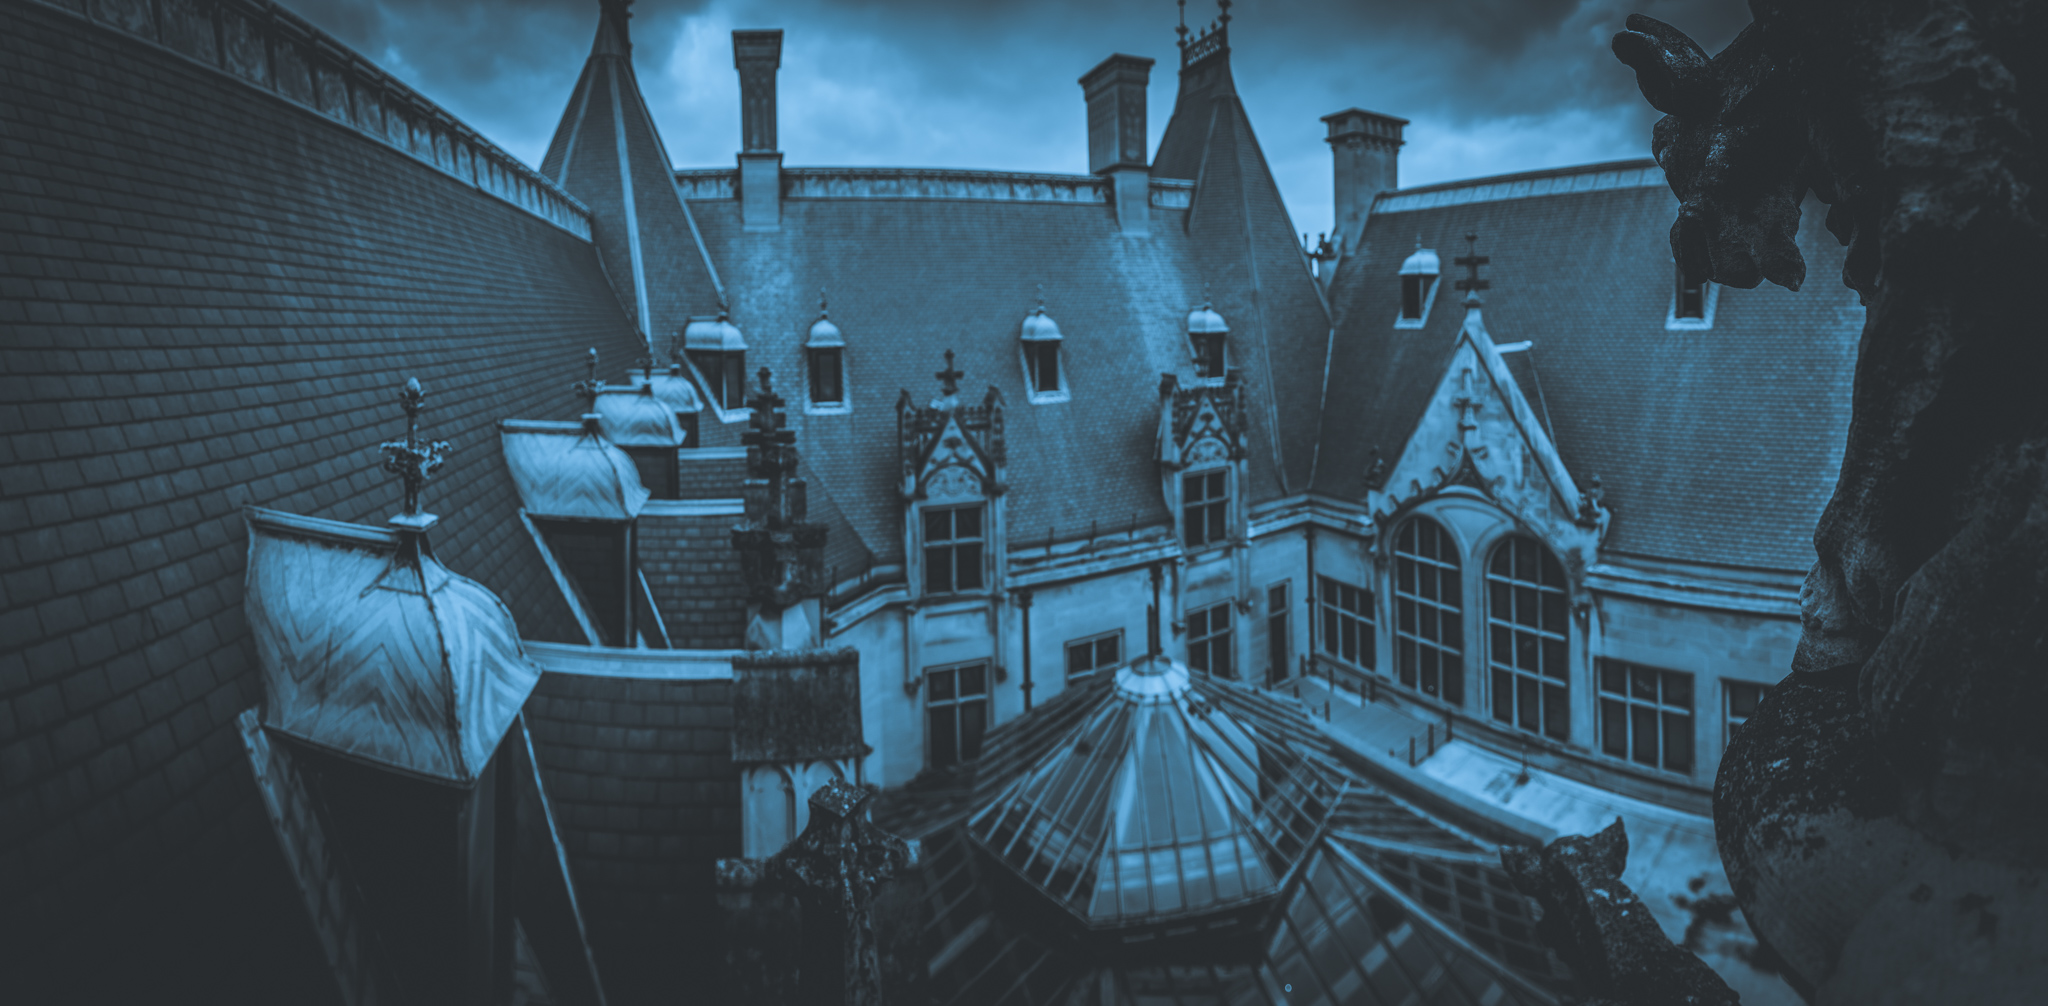 001biltmorehouse-southerngothic-mattrossphotography.com.jpg